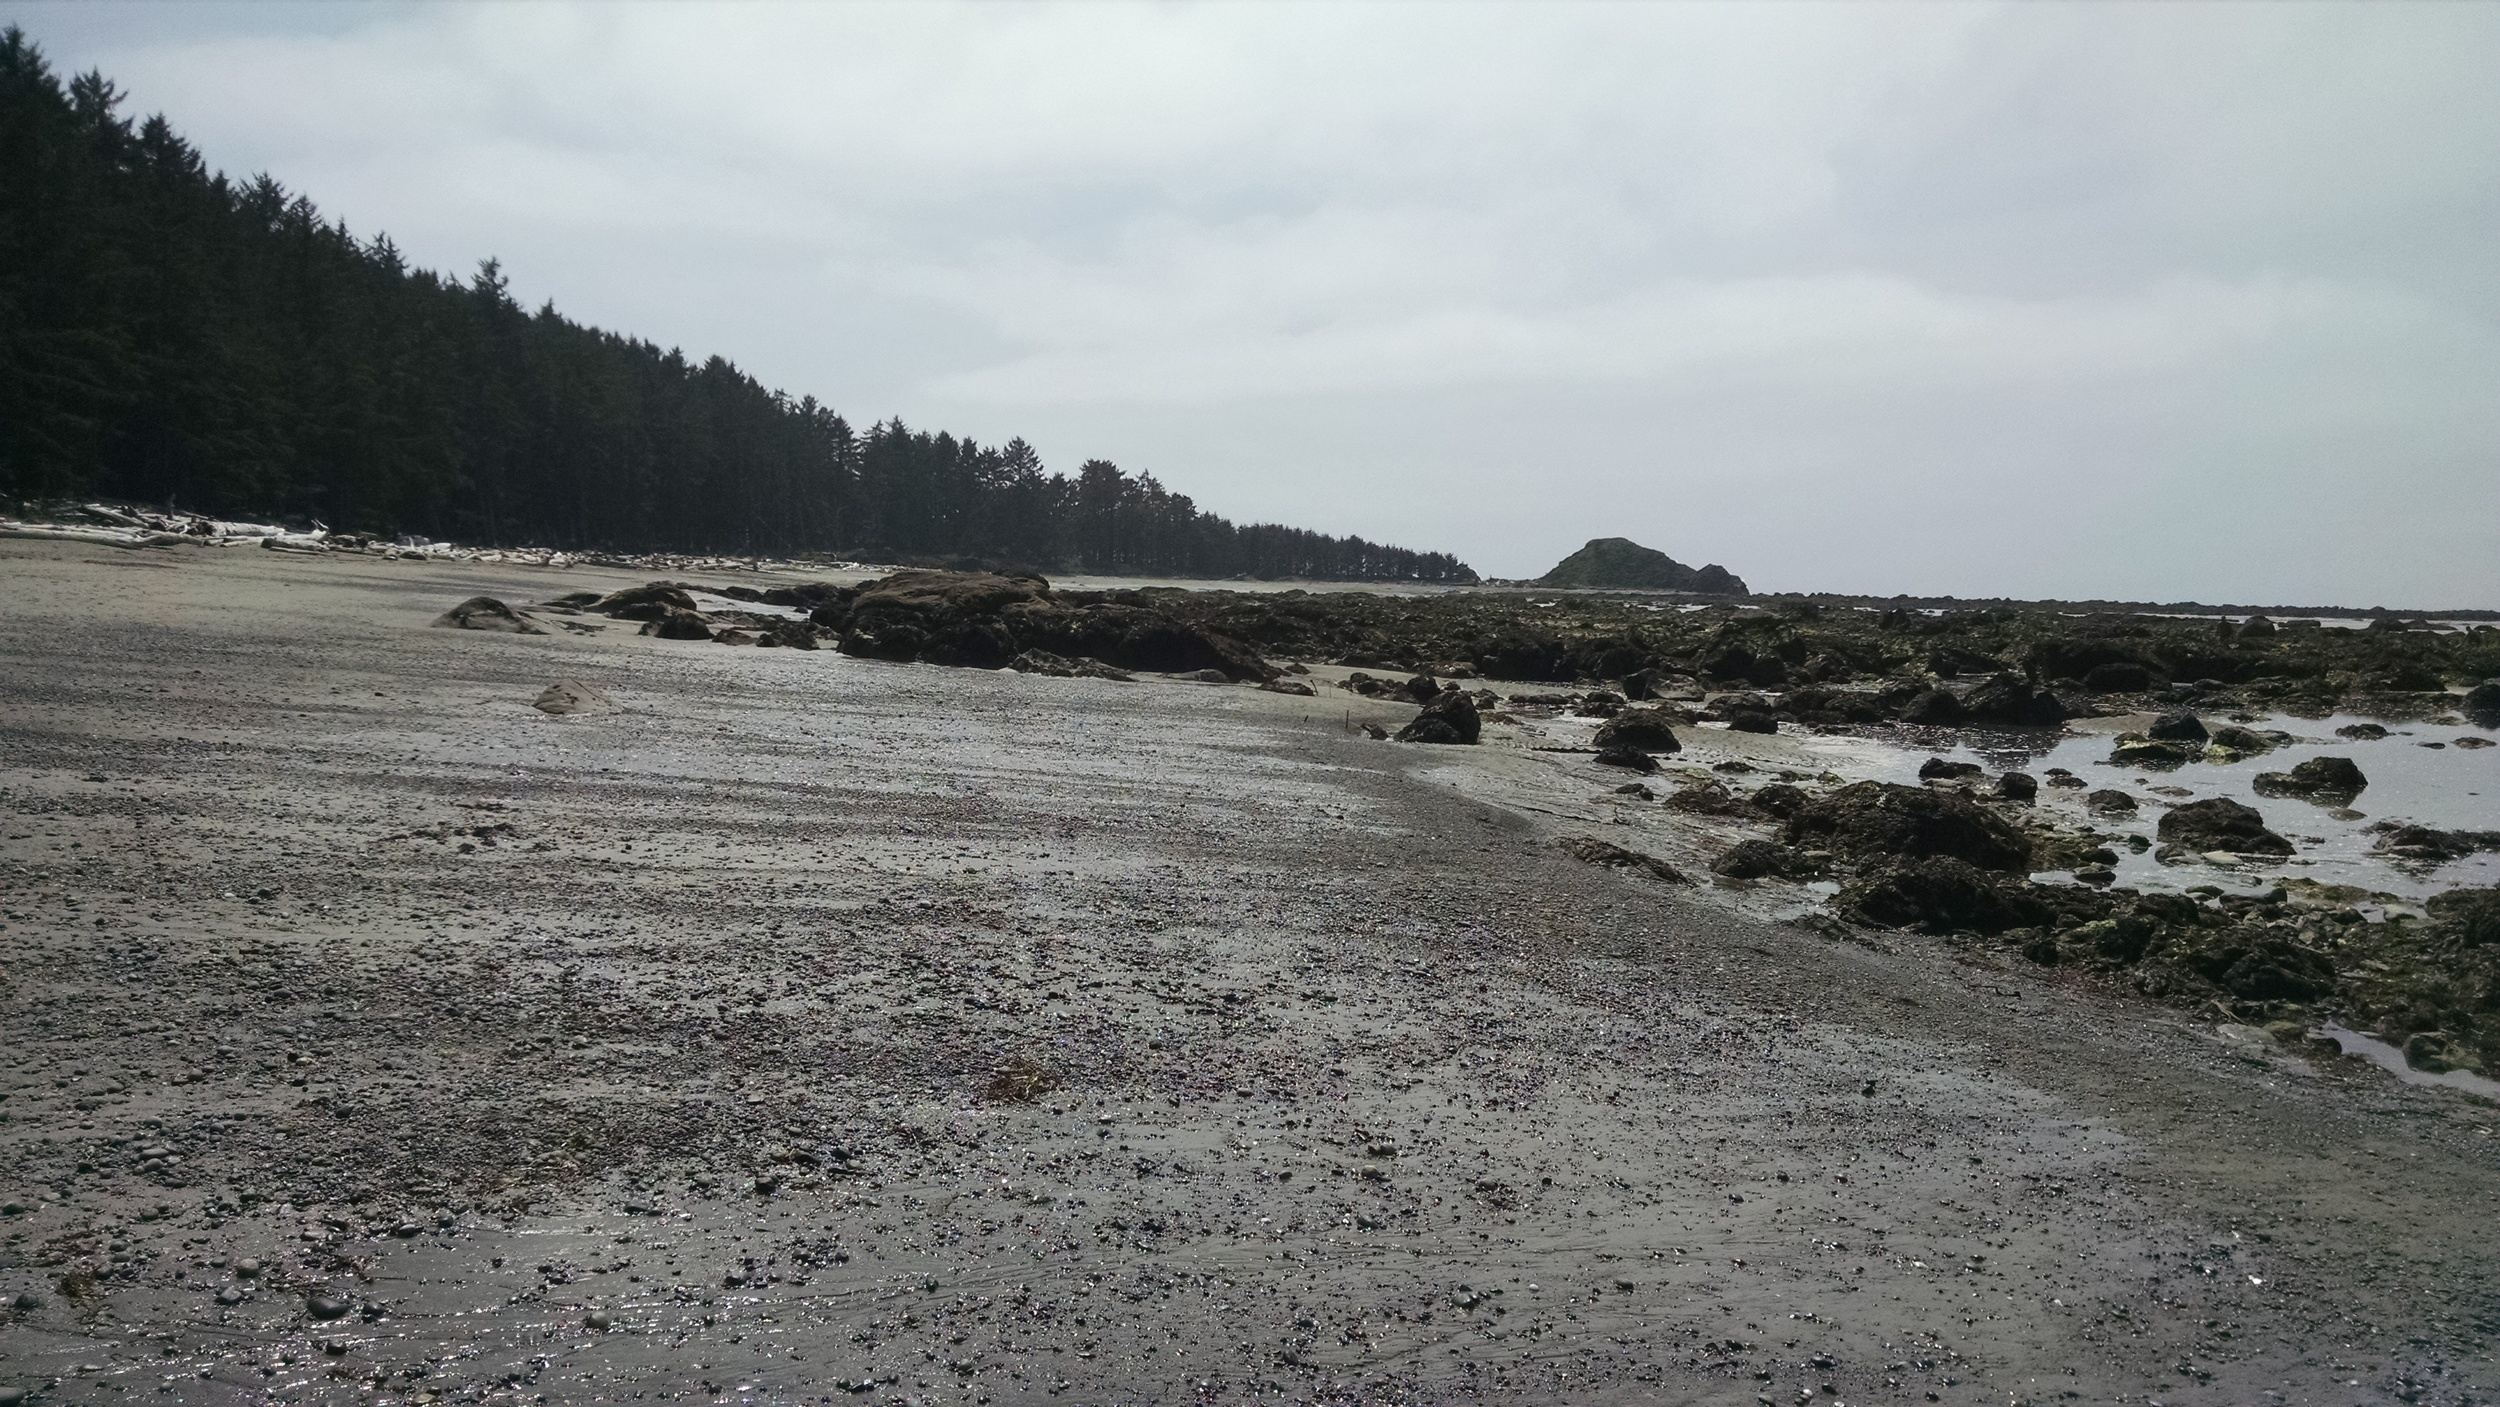 The wild Pacific coast